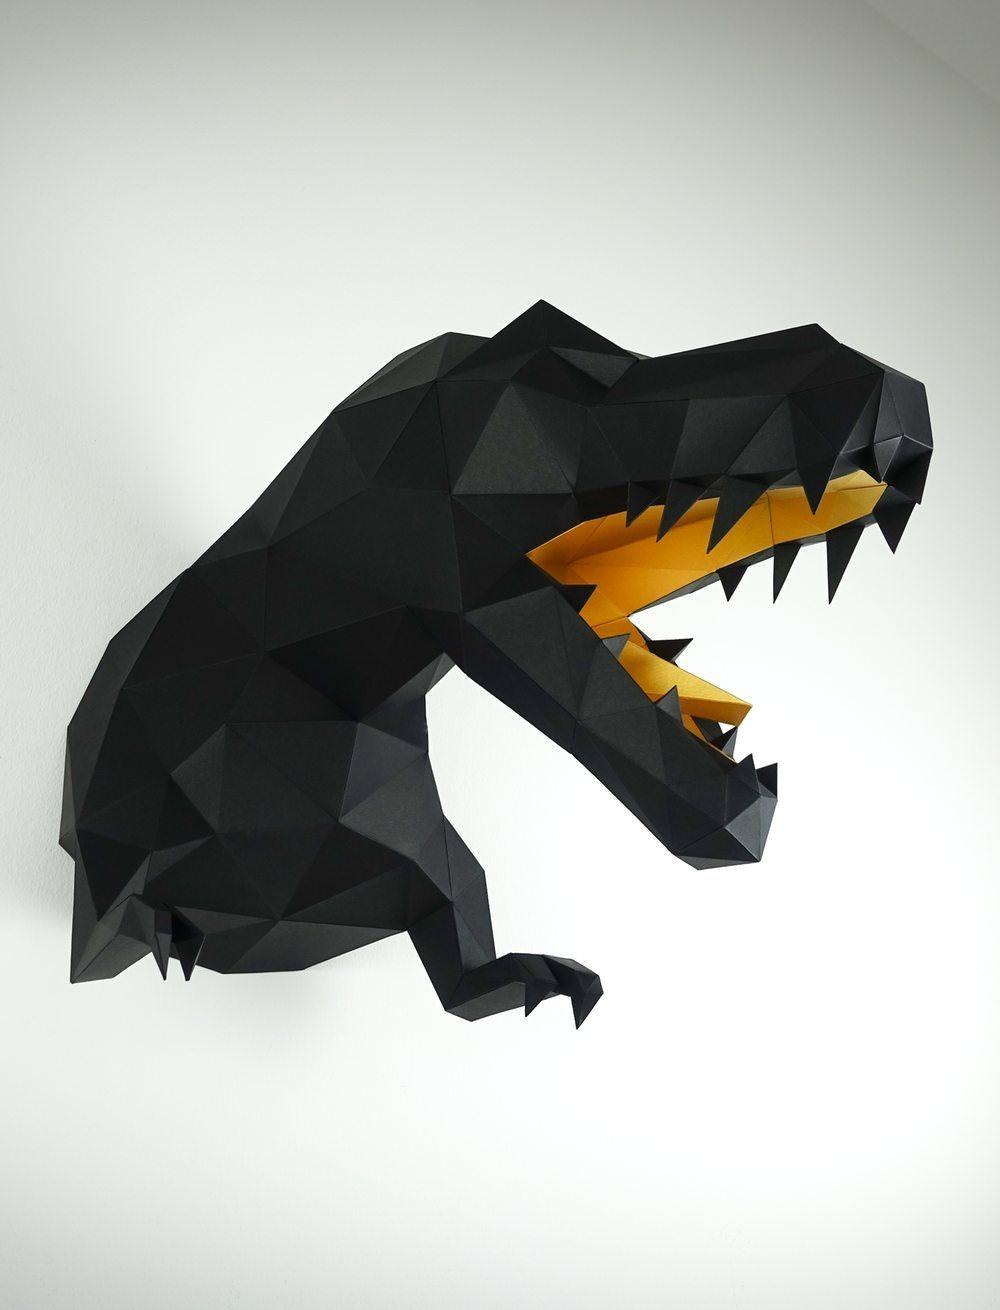 Papercraft Dinosaur Trex Wanddekoration Wandtrophäe